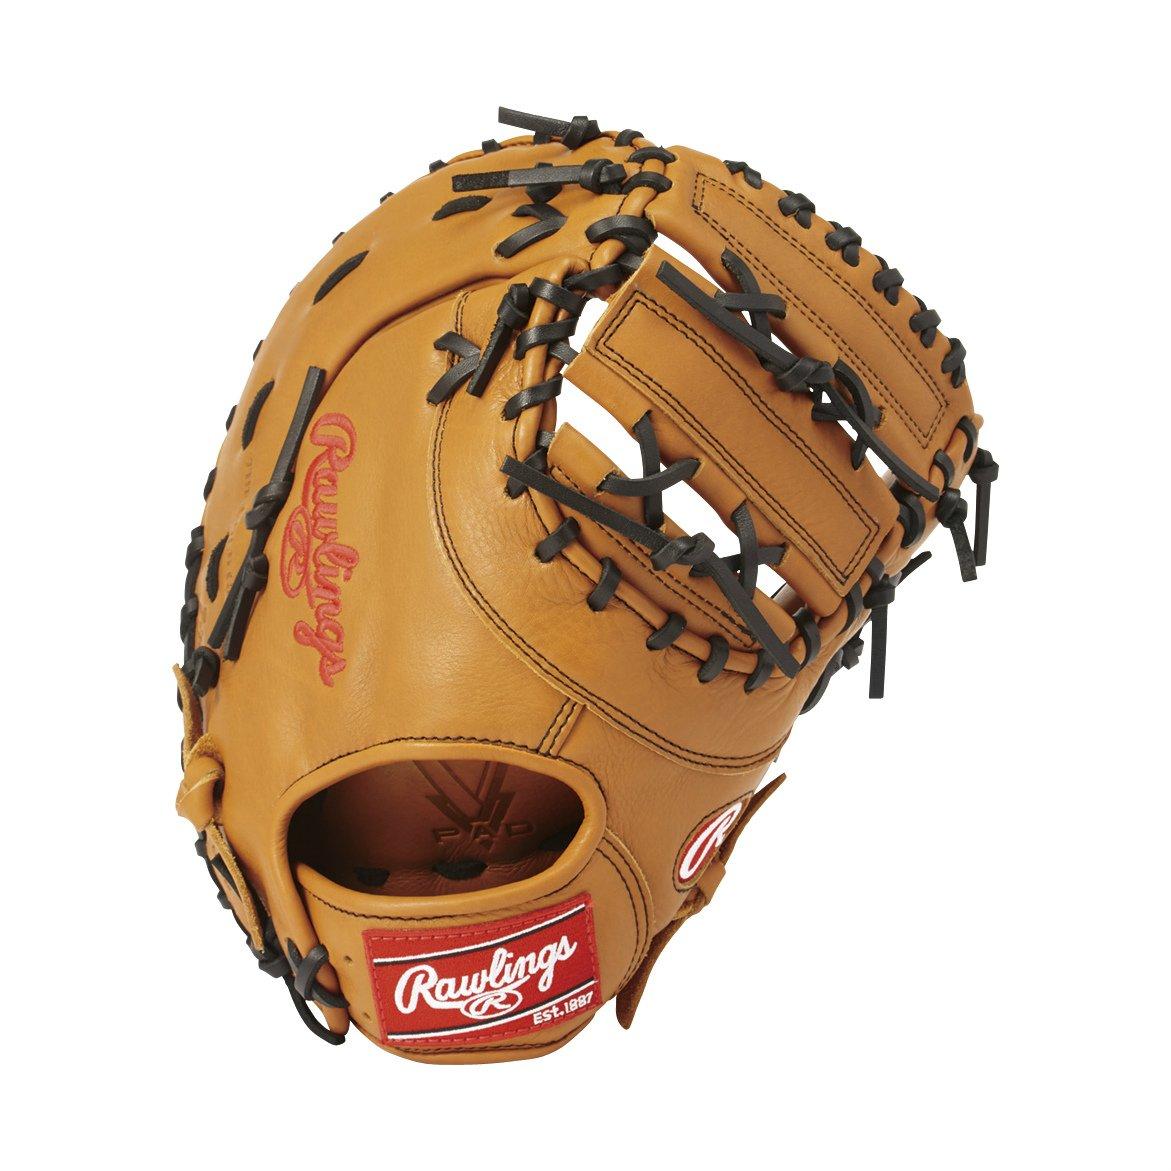 Rawlings(ローリングス) ソフトボール用 ソフト HYPER TECH DP[ファースト用] GS8HT3ACD B075Z4QW4G [サイズ 12.5] [12 1/2inch] LH(Right hand throw)※右投用|リッチタン リッチタン [サイズ 12.5] [12 1/2inch] LH(Right hand throw)※右投用